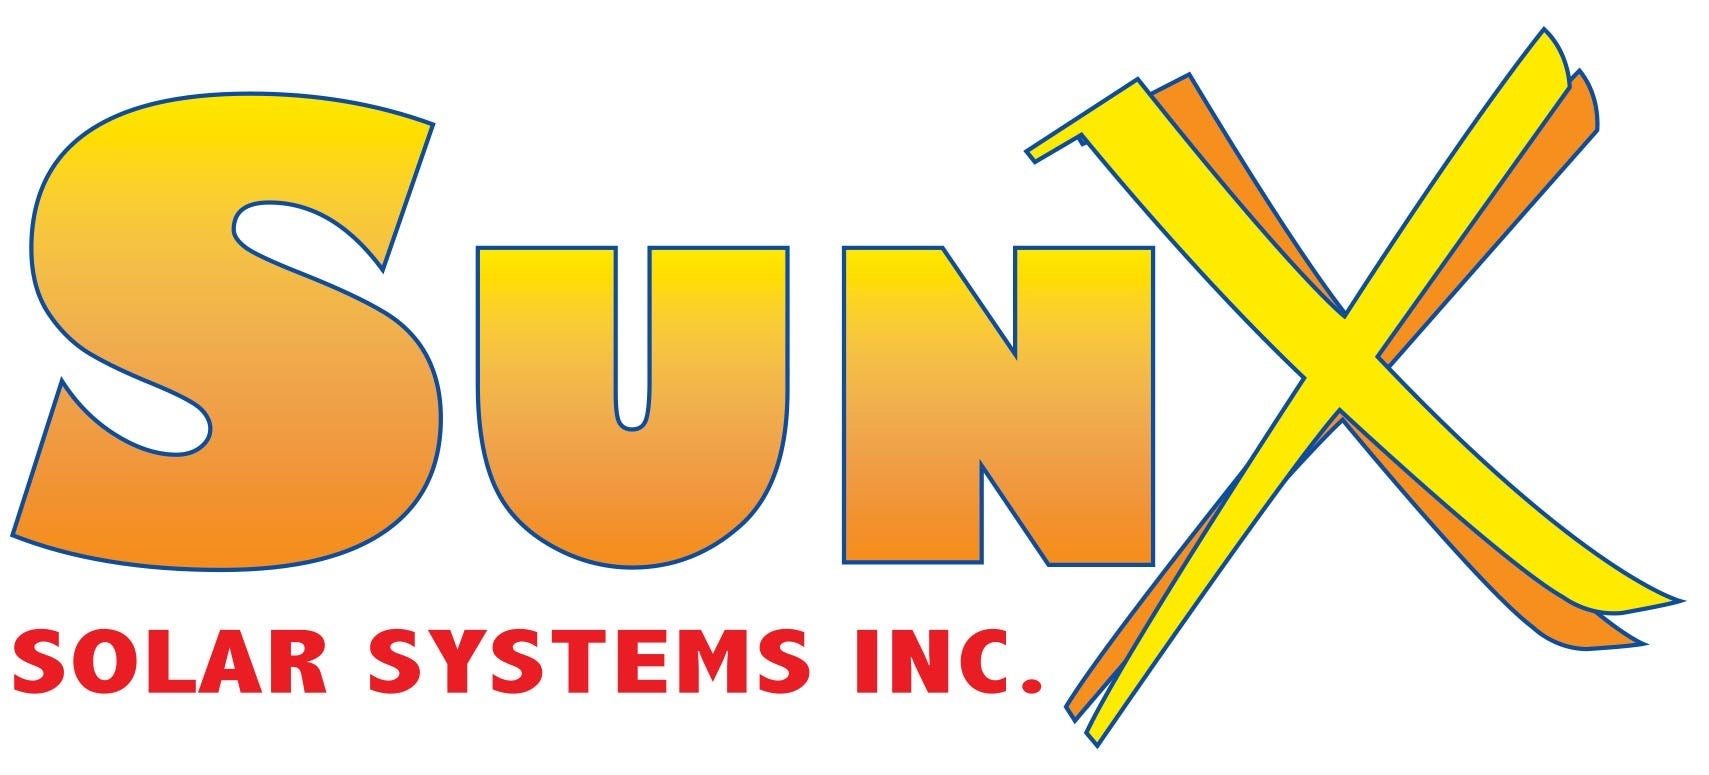 Vivint solar reviews california - Elegant Sun X Solar Inc With Best Solar Panel Companies In California